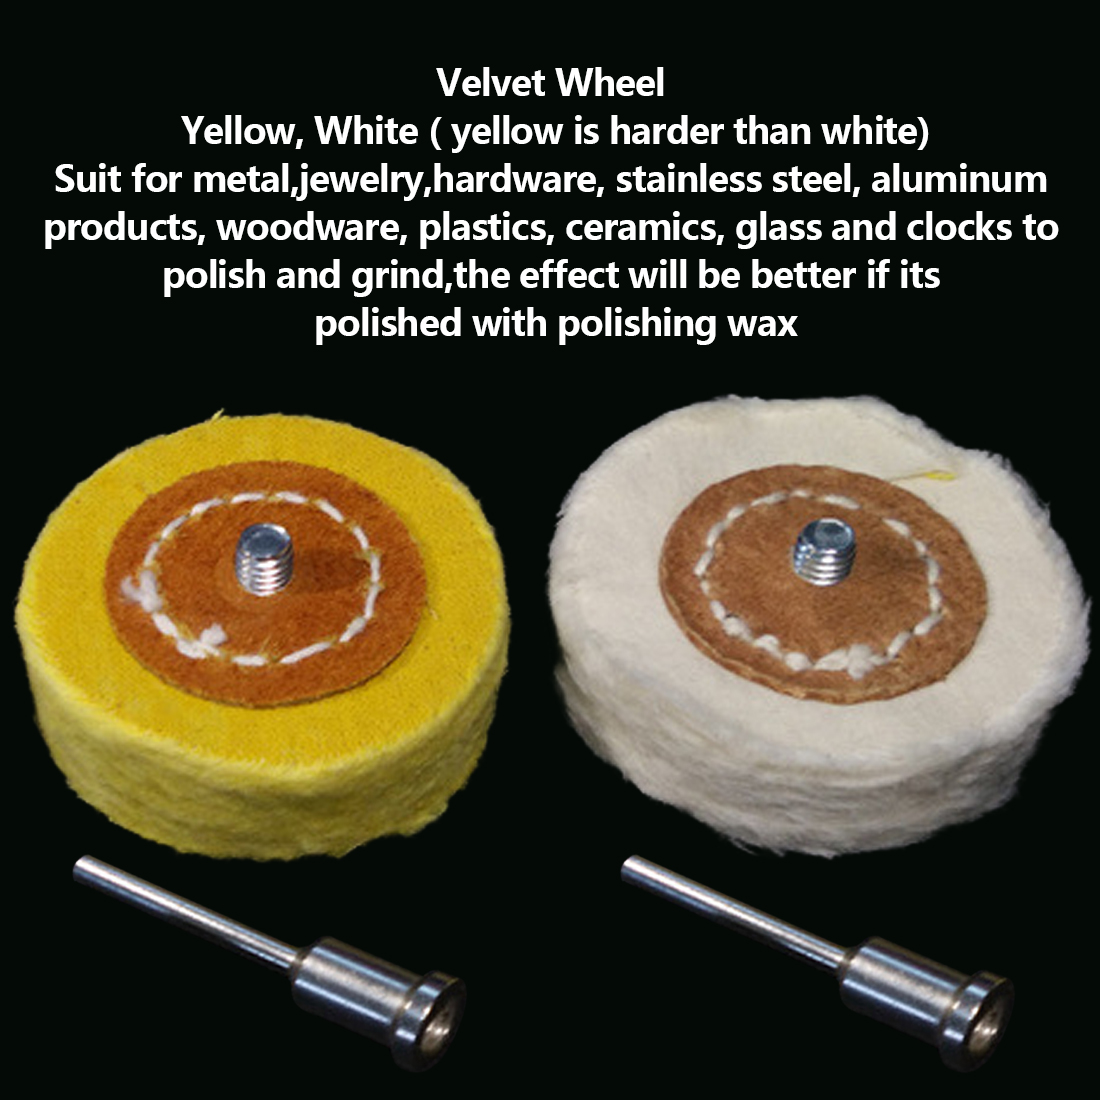 Dremel Wheel Grinder Brush T Style Polish Buffing Wheel Grinding Head Cloth For Rotary Abrasive Tools Dremel Accessories Shank